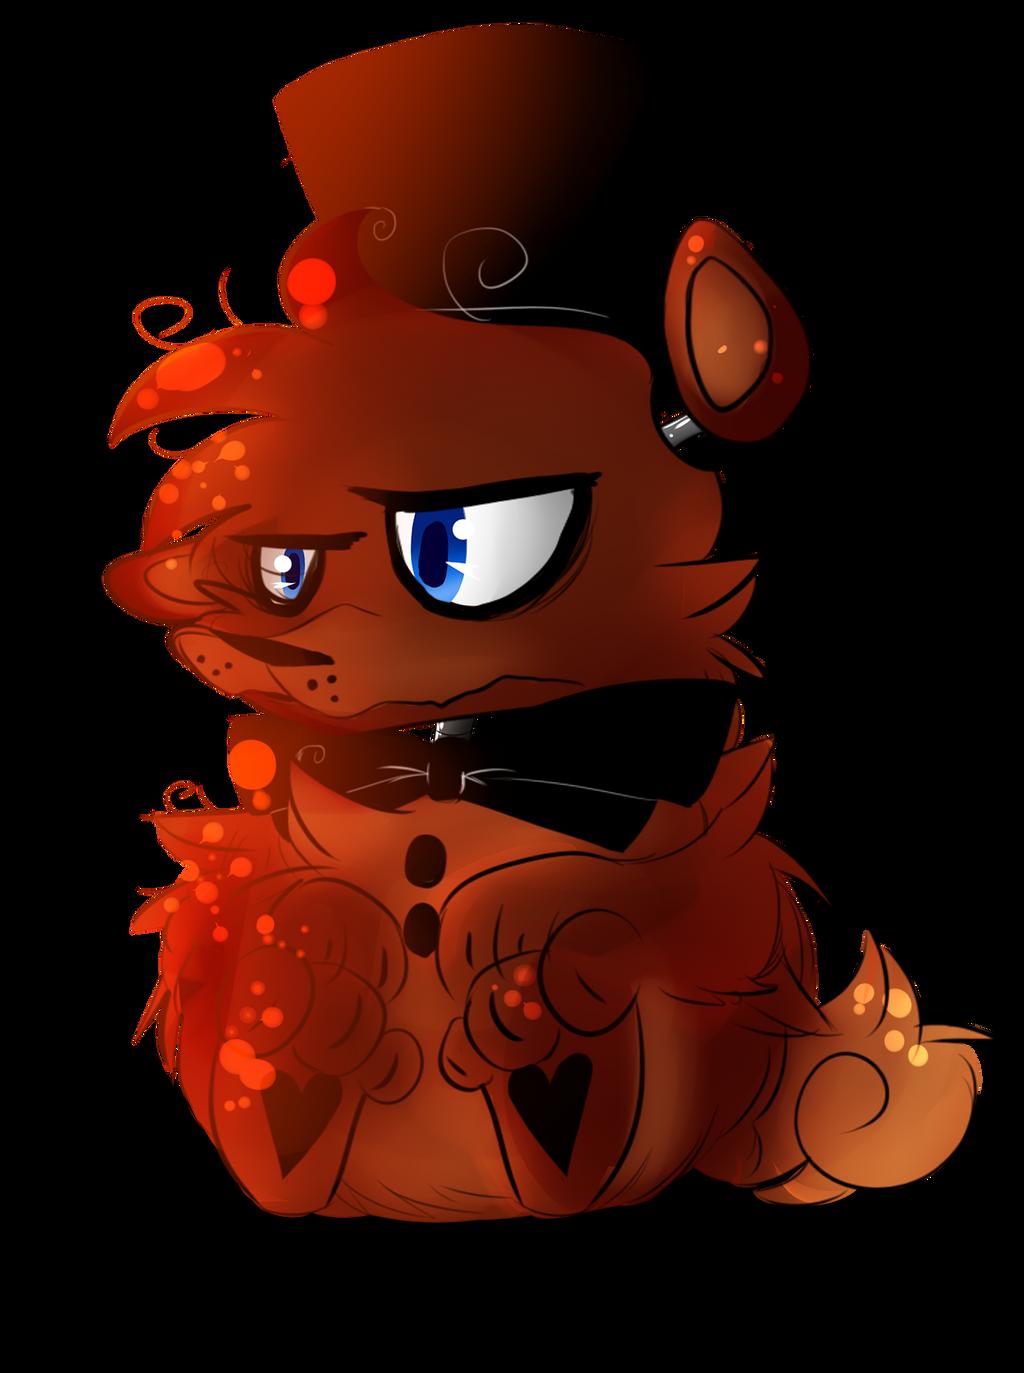 teddy bear by caramelcraze on deviantart